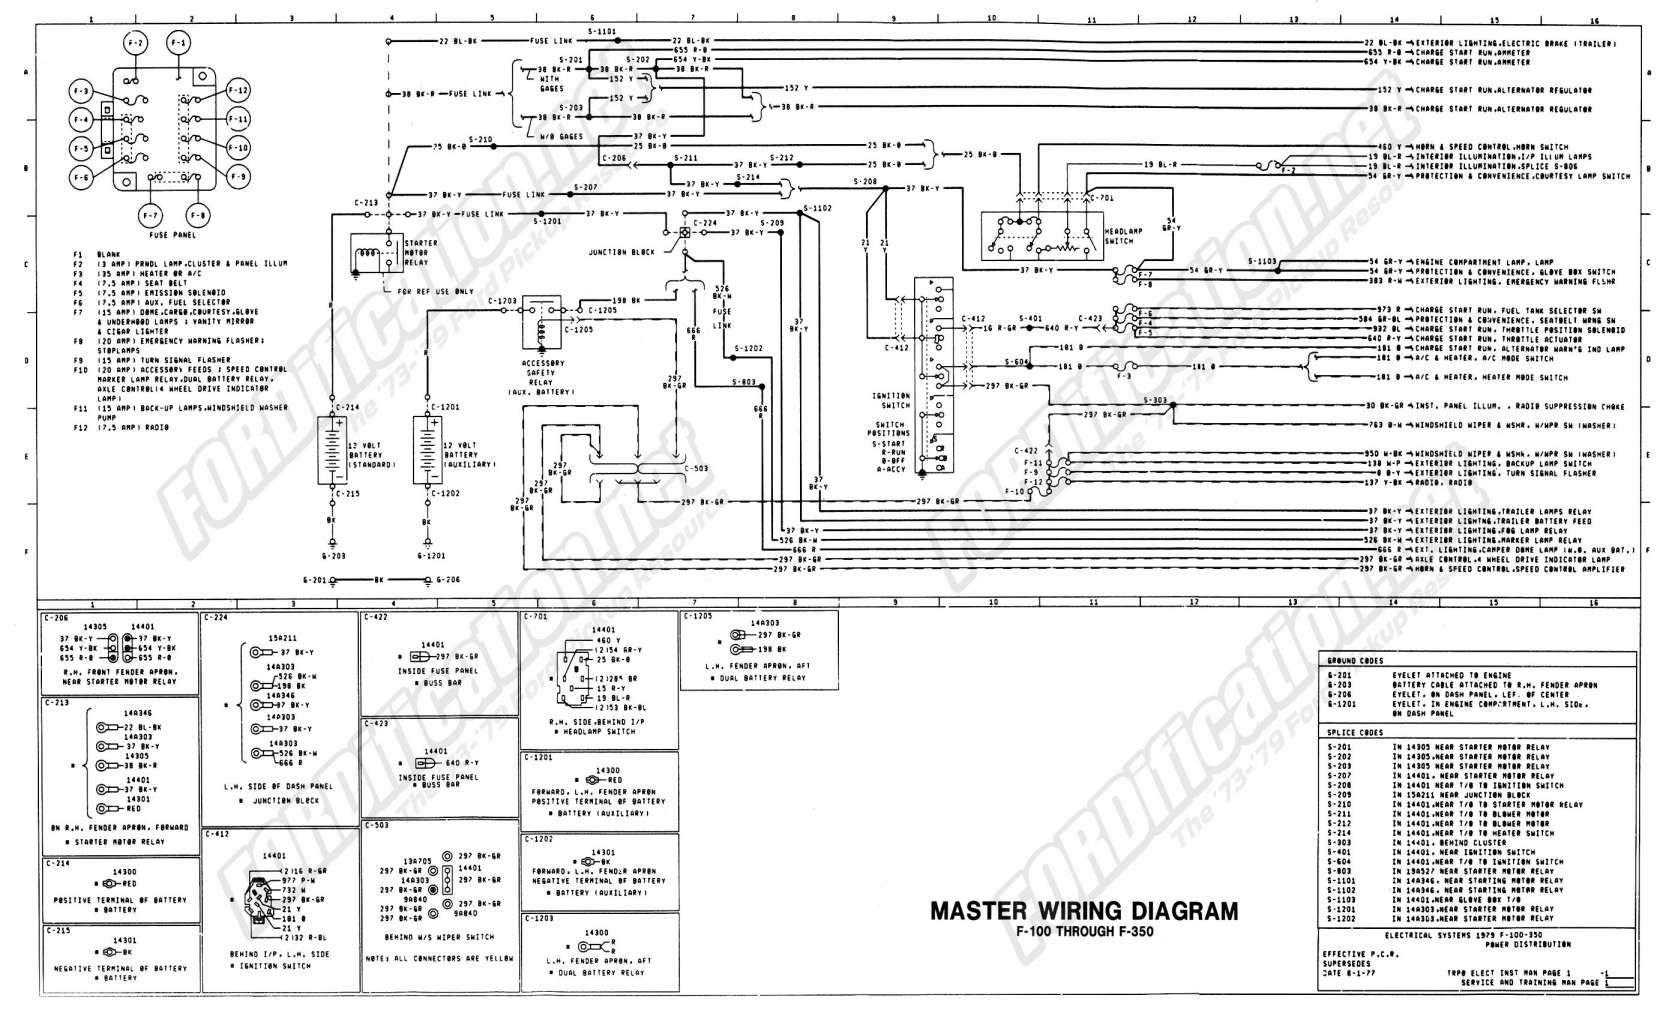 ford l8000 lighting diagram ford l9000 ac wiring diagram lari www dekleineontdekker be  ford l9000 ac wiring diagram lari www